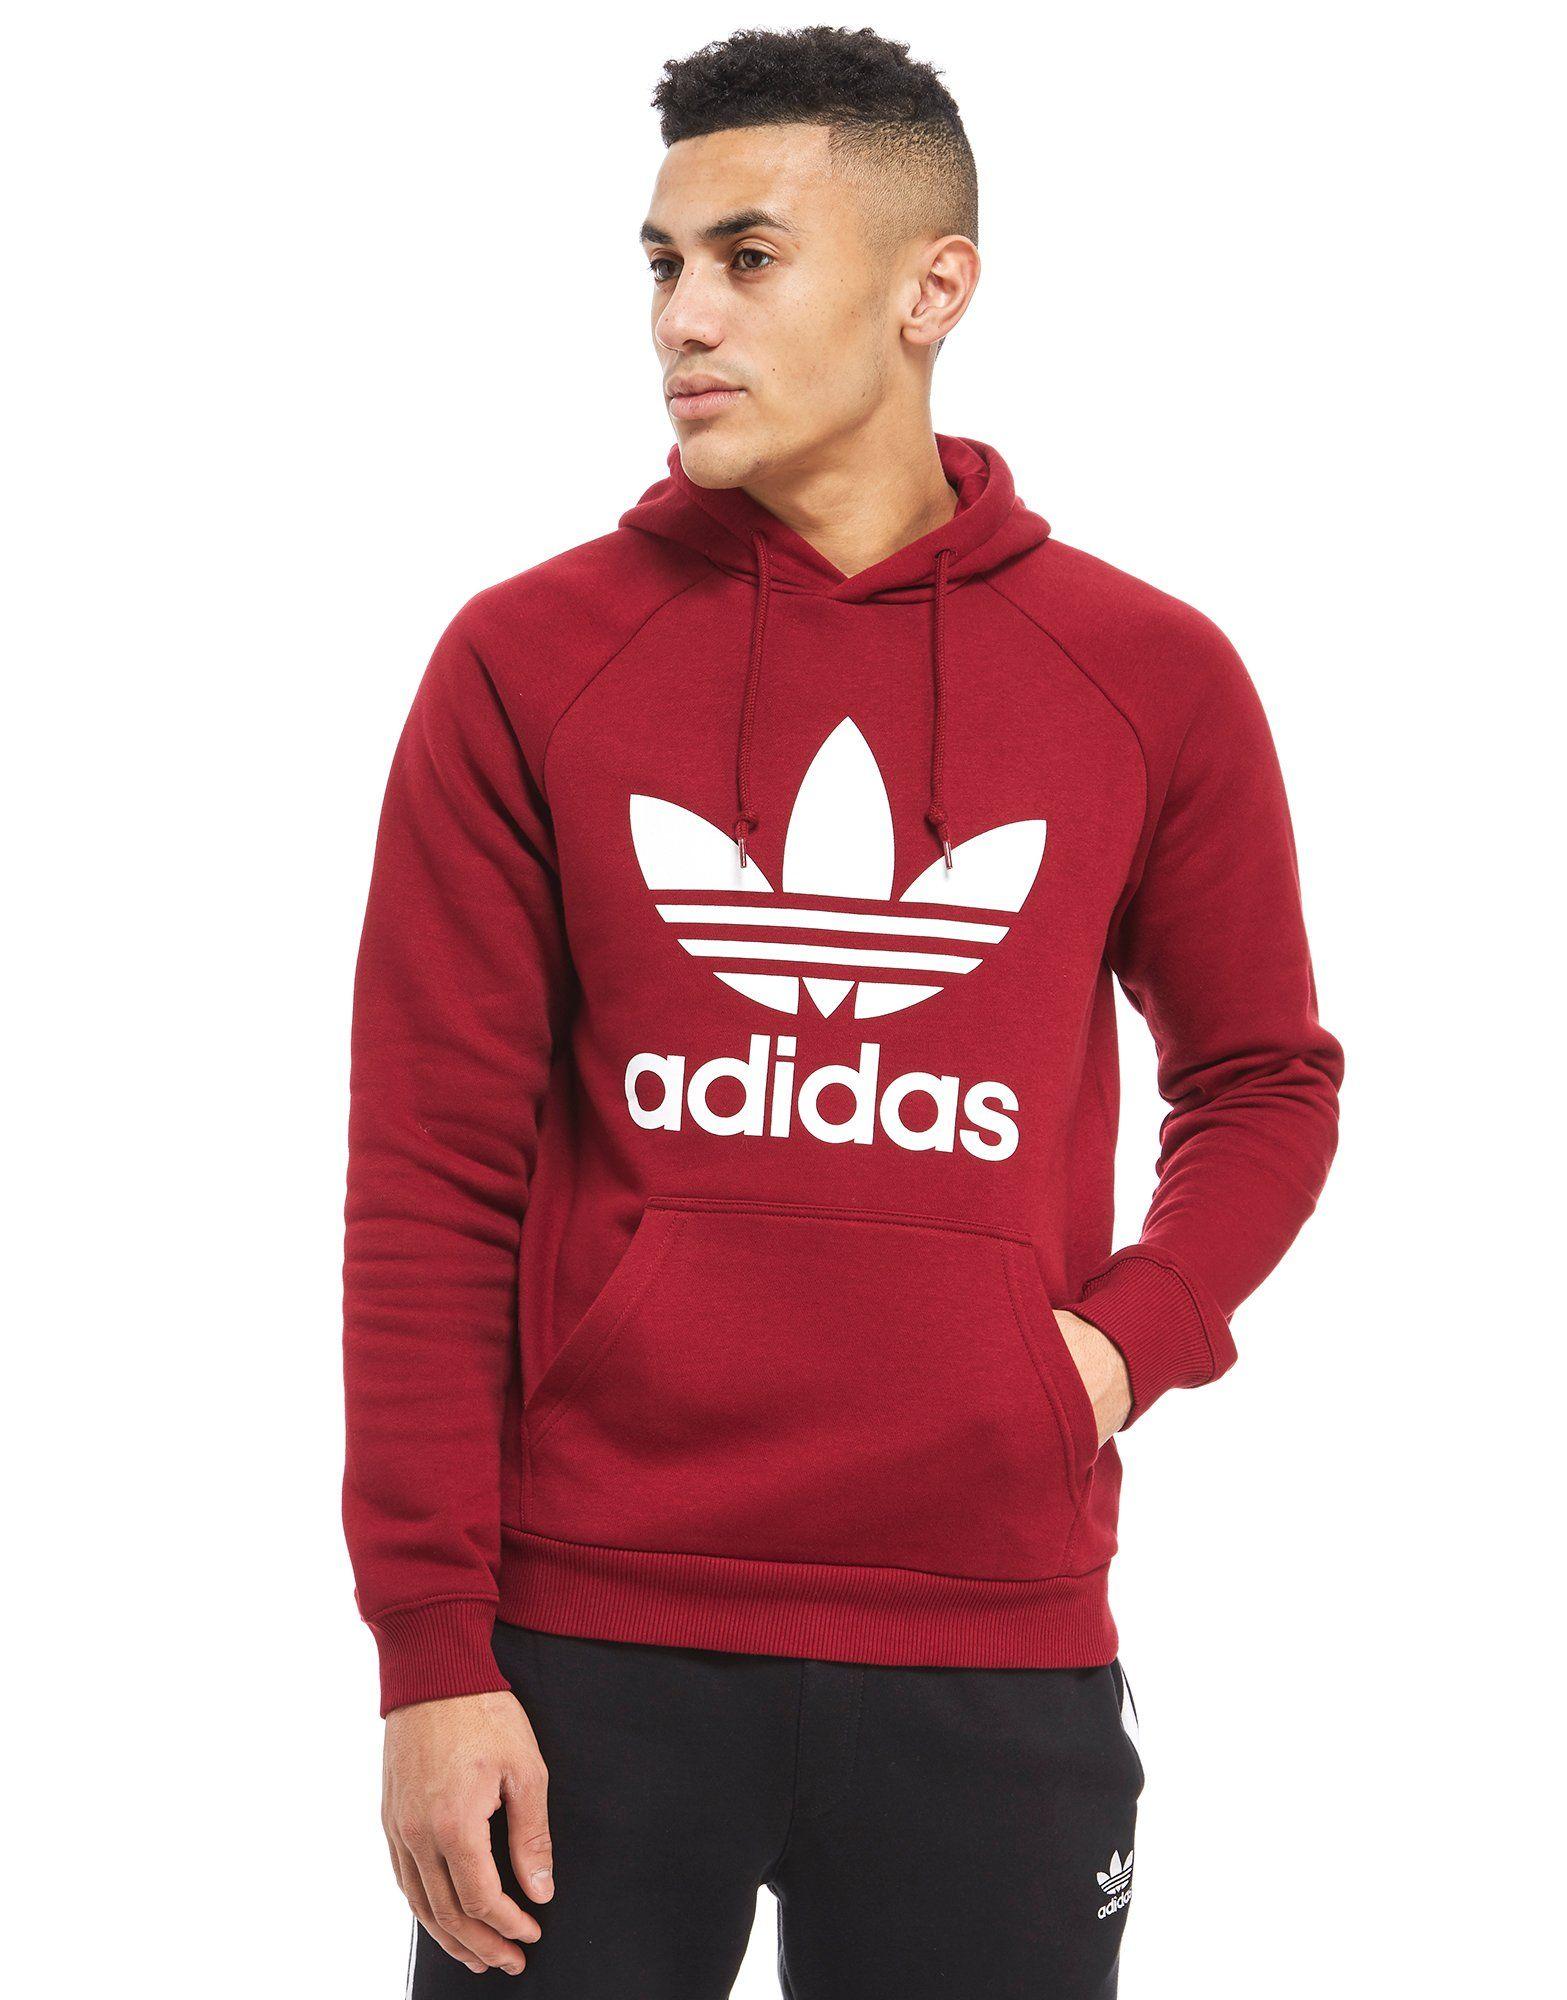 7796d84a5a21 Adidas Red Hoodies l-d-c.co.uk